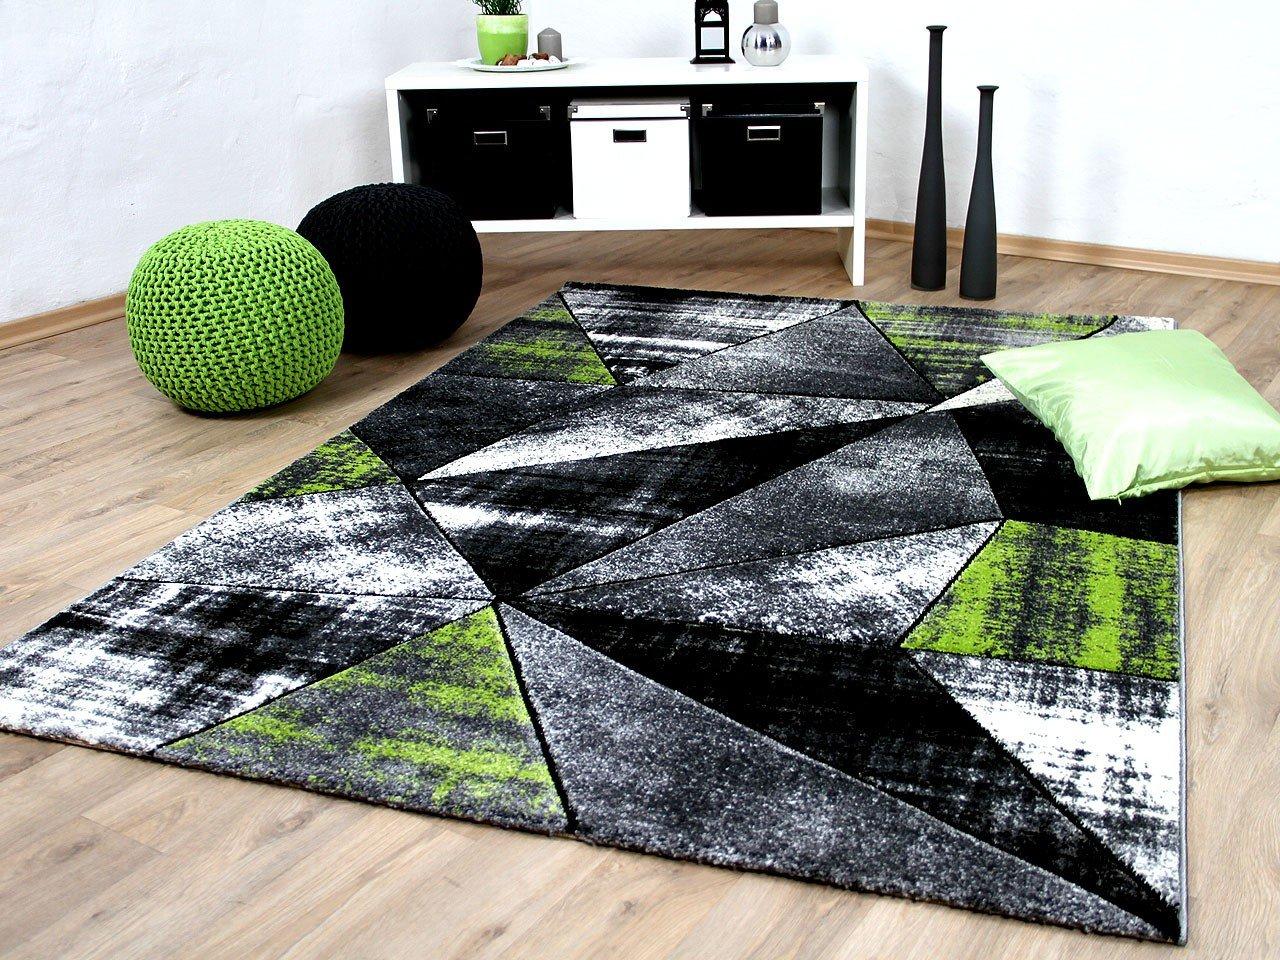 Designer Teppich Brilliant 5 Grau Grun Magic In 5 Brilliant Grossen